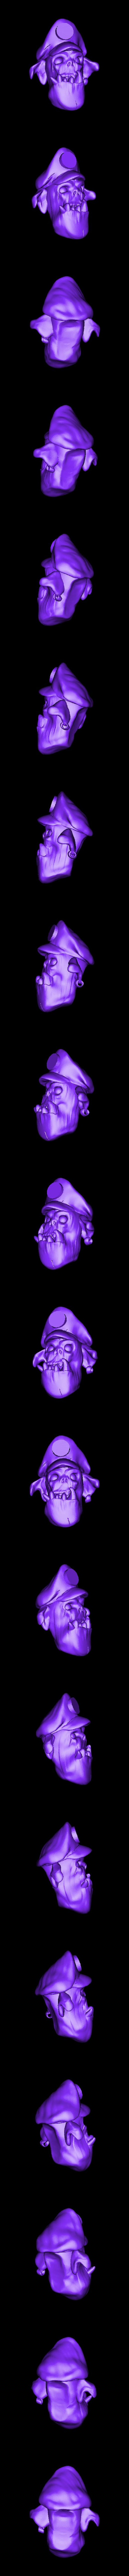 Ork_Head_3.stl Download free STL file Miniature - Ork Heads (Heroic Scale) (2016) • 3D printing object, whackolantern